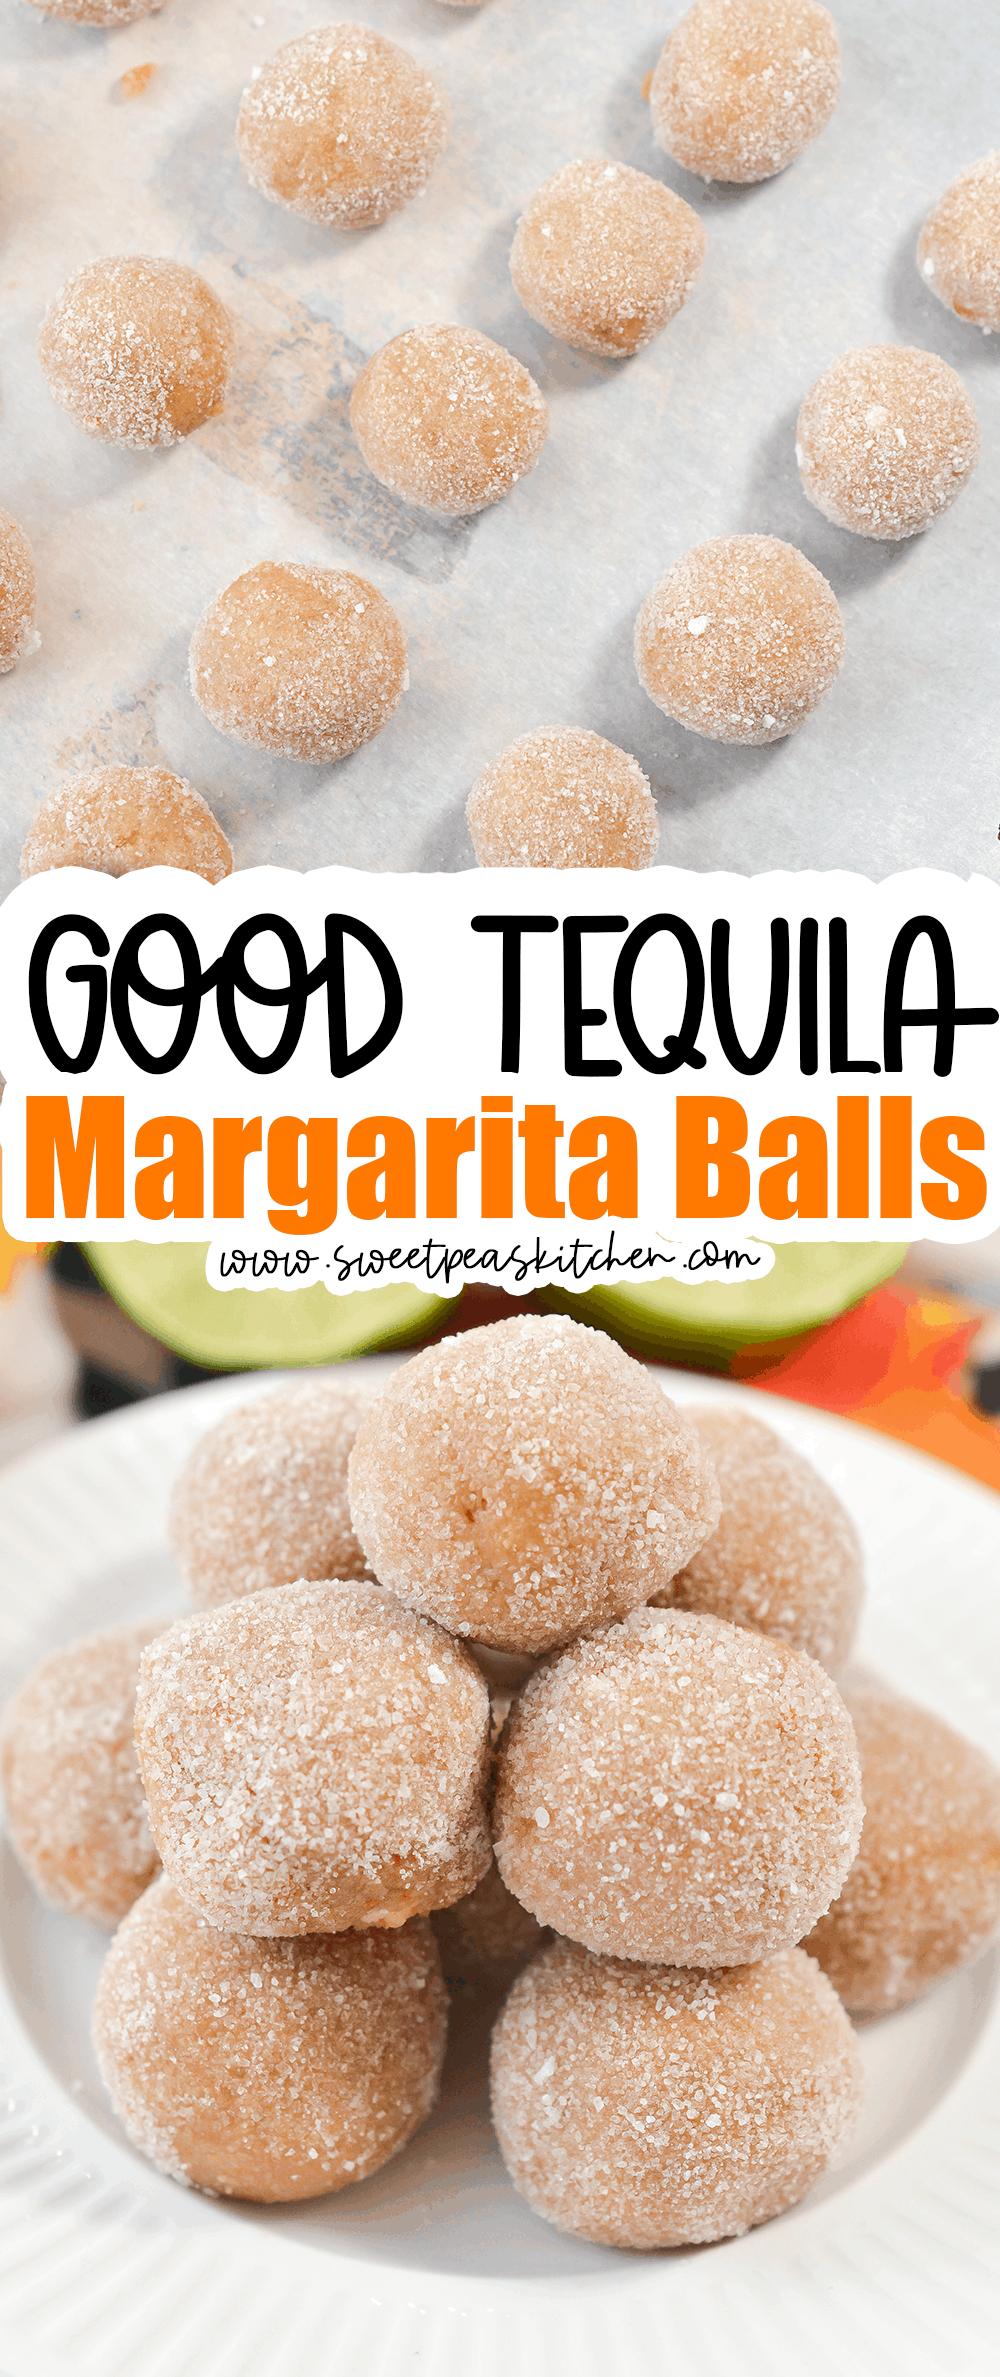 Tequila Margarita Balls